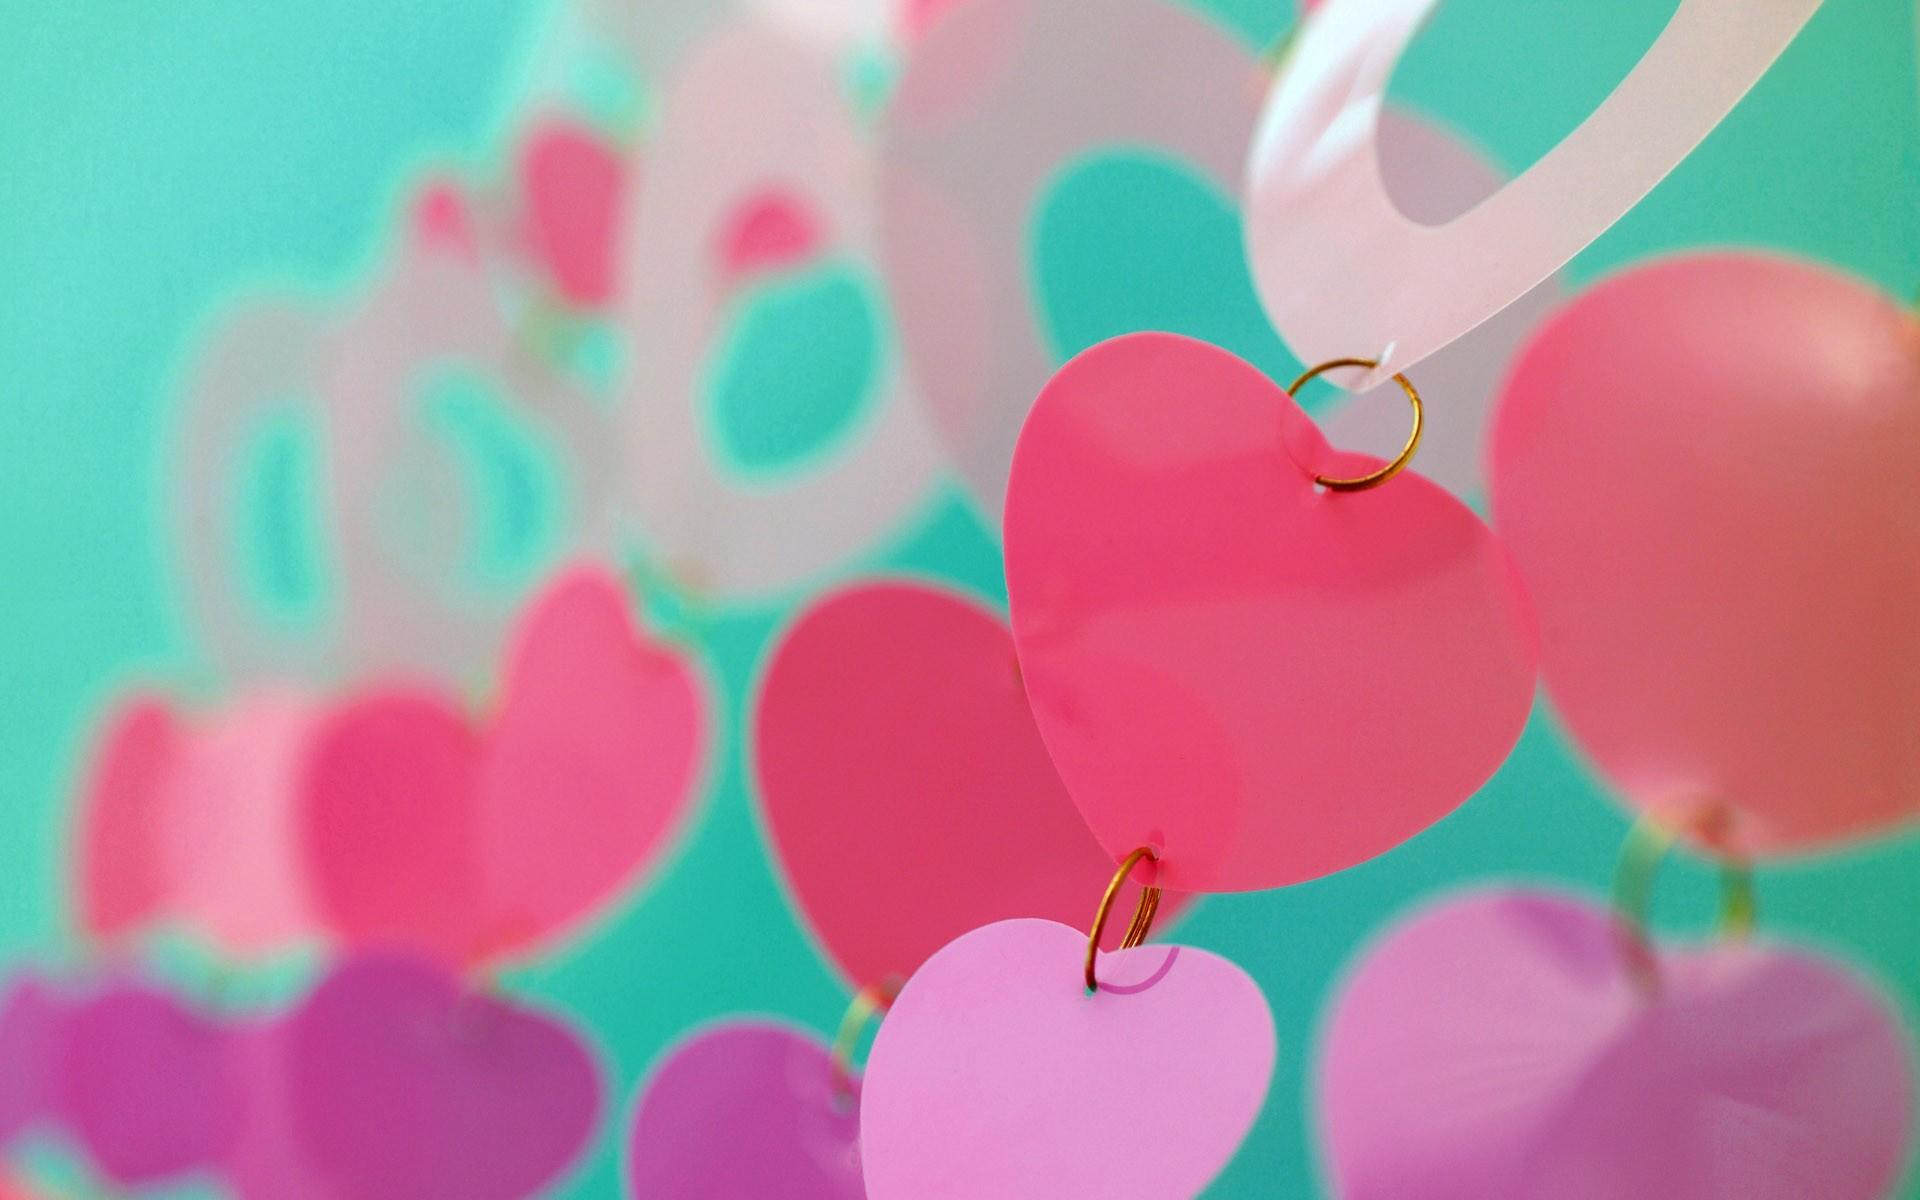 Cute Love Wallpapers For Desktop 14 Free Hd Wallpaper